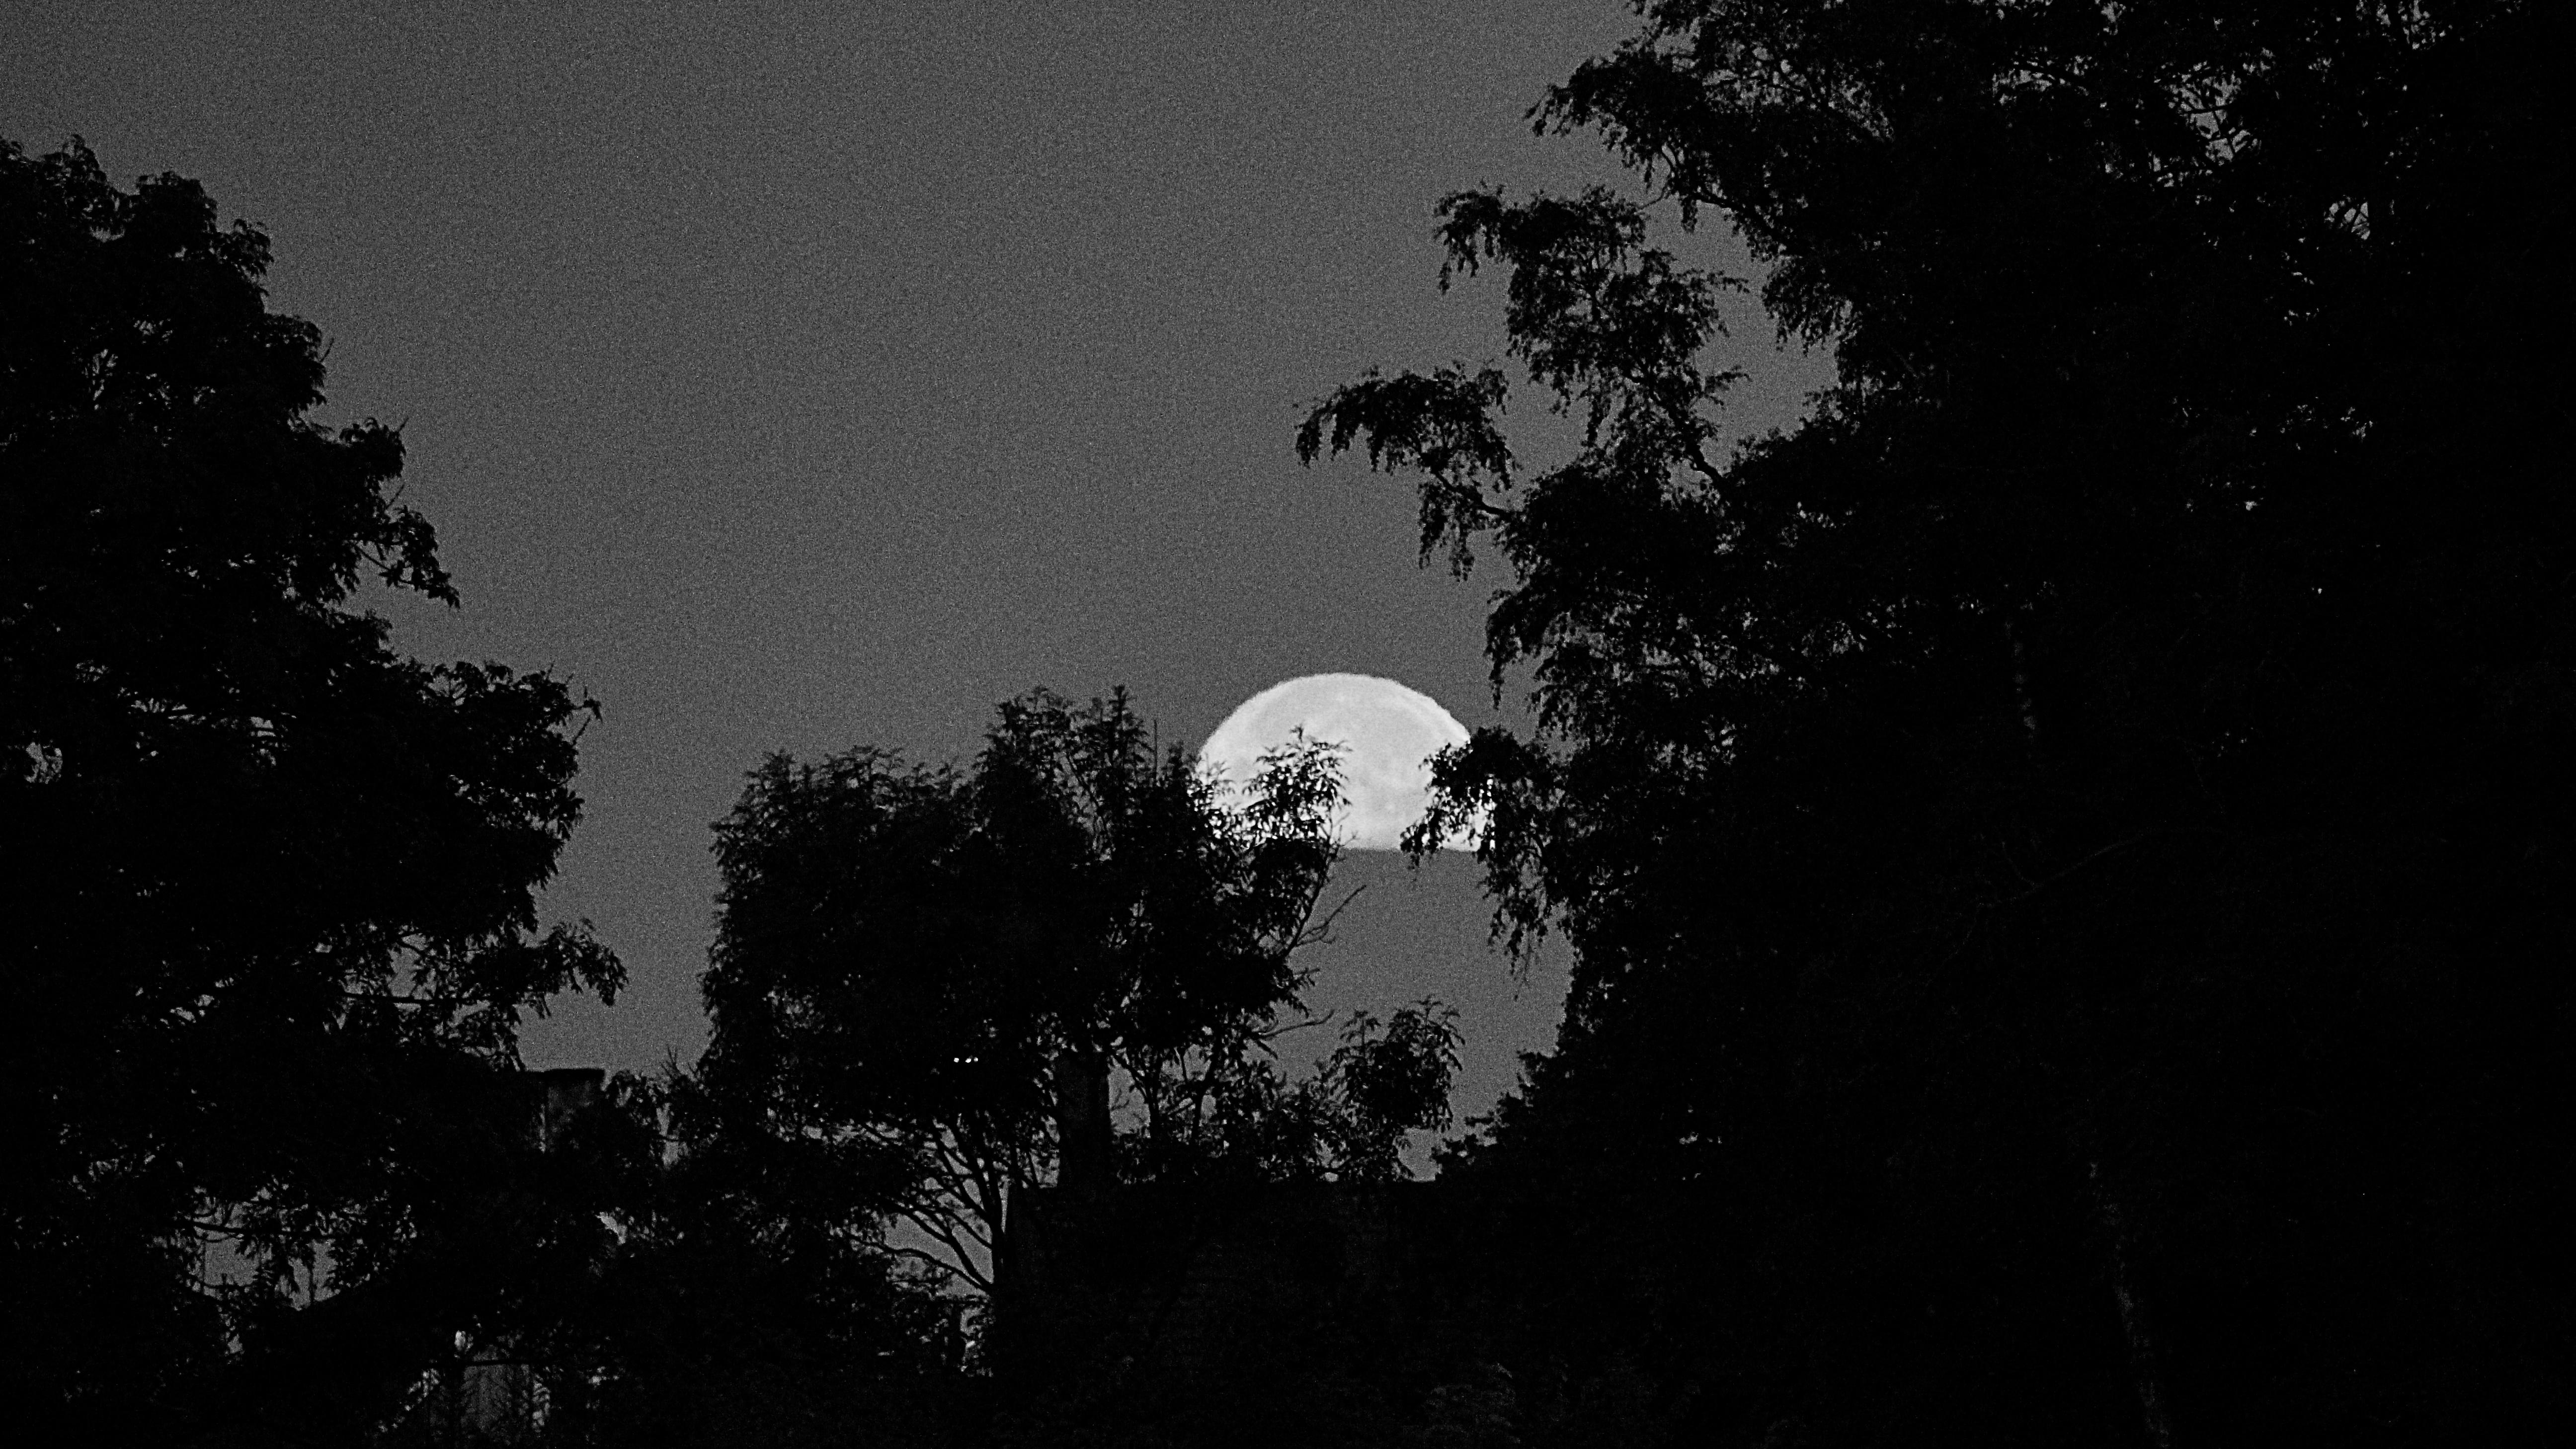 Wallpaper Sunlight Night Sky Silhouette Moon